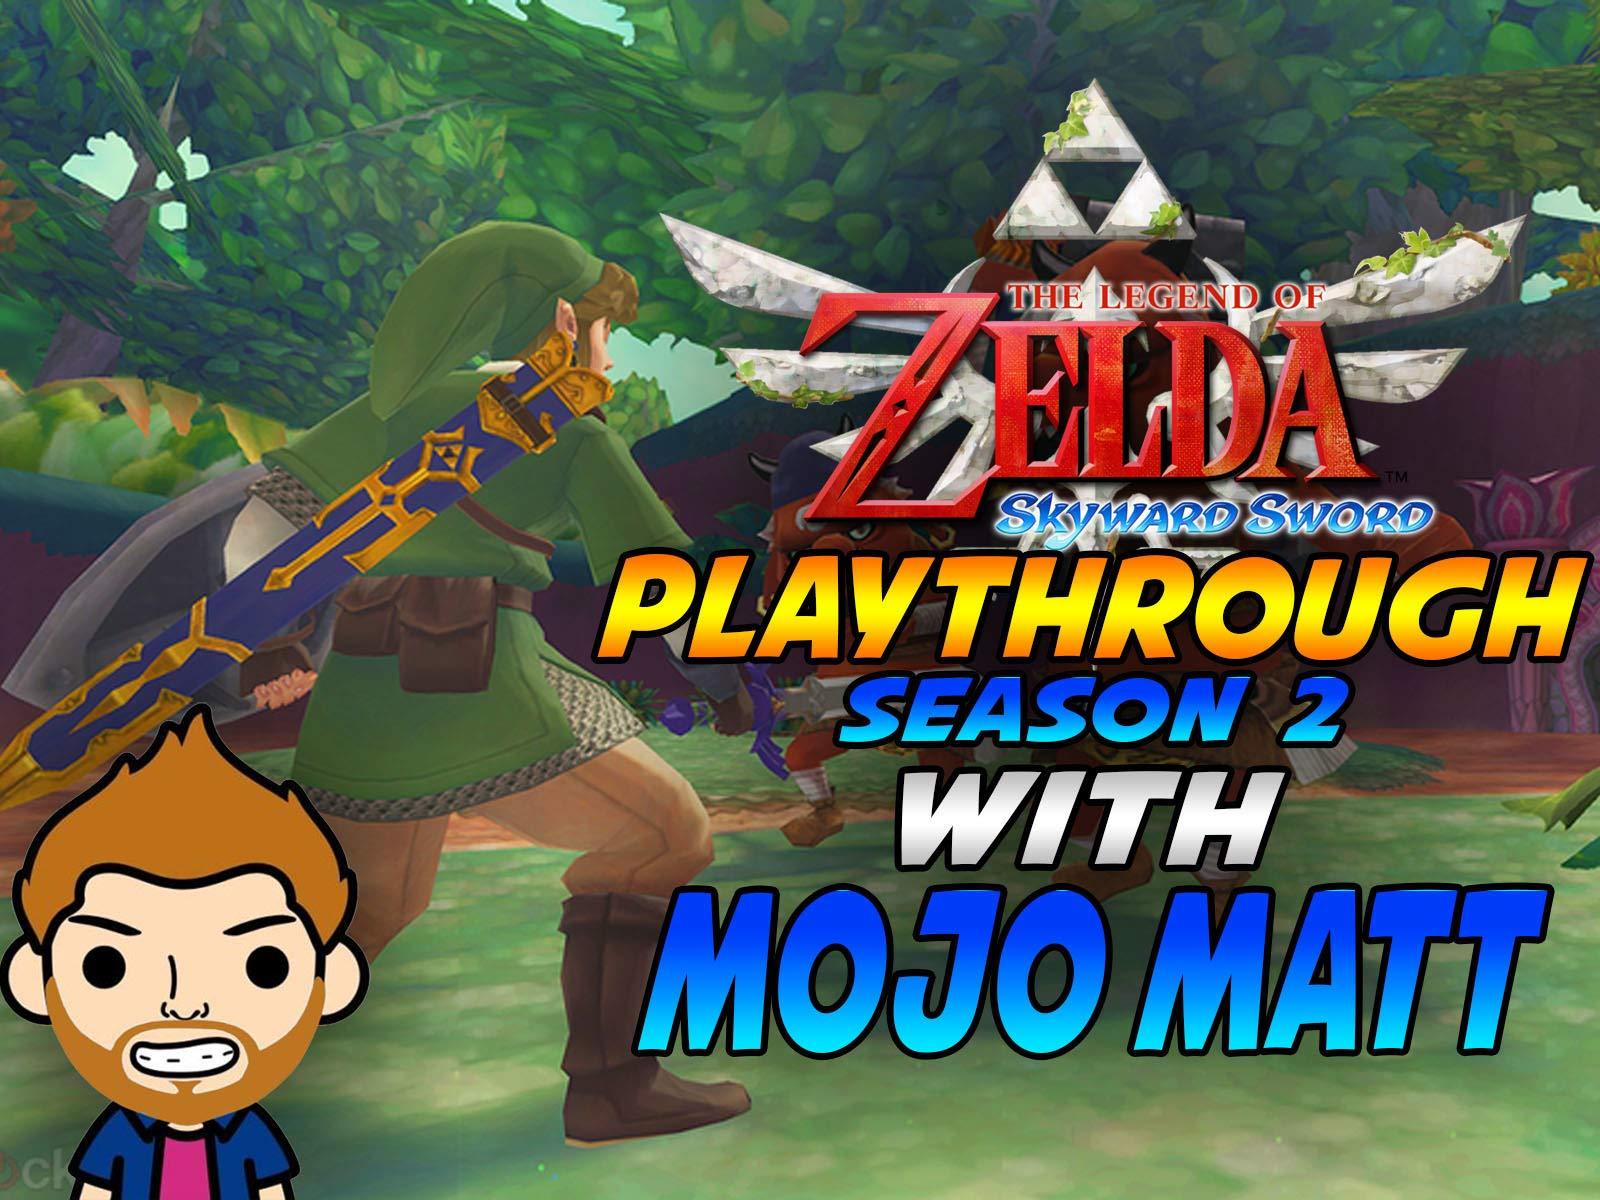 The Legend Of Zelda Skyward Sword Playthrough With Mojo Matt on Amazon Prime Instant Video UK